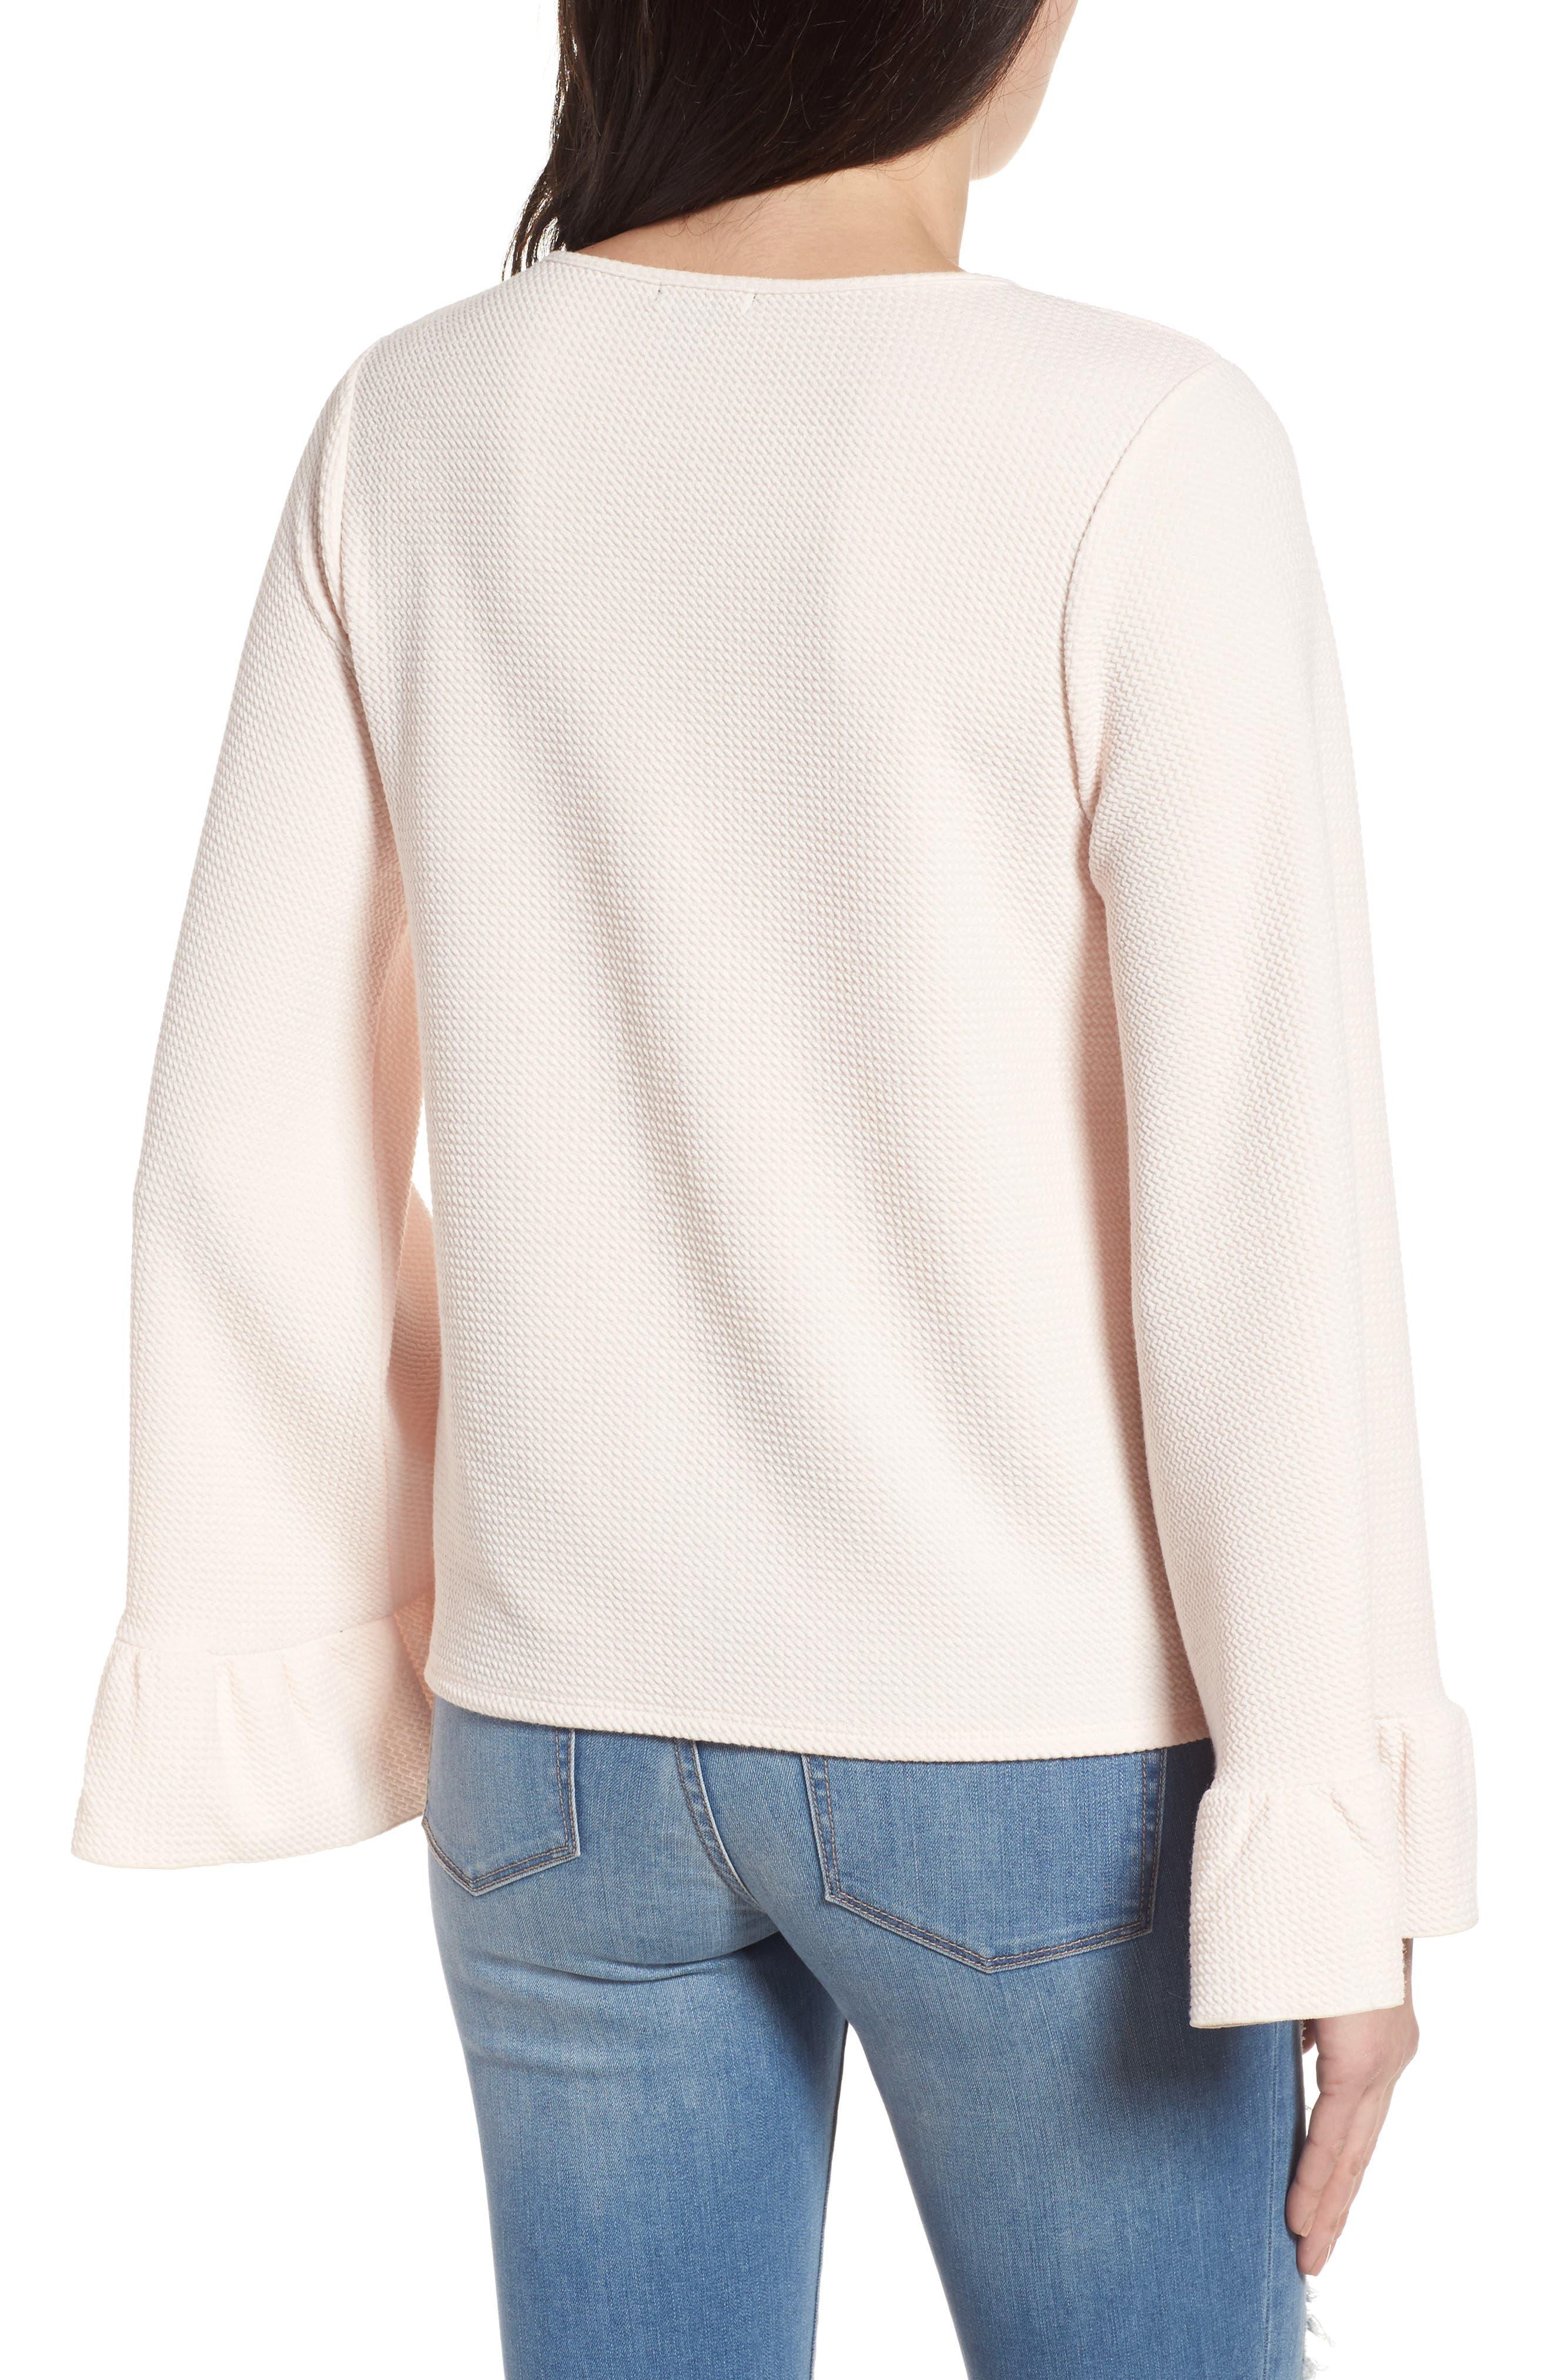 Alternate Image 2  - Halogen® Ruffle Cuff Knit Top (Regular & Petite)